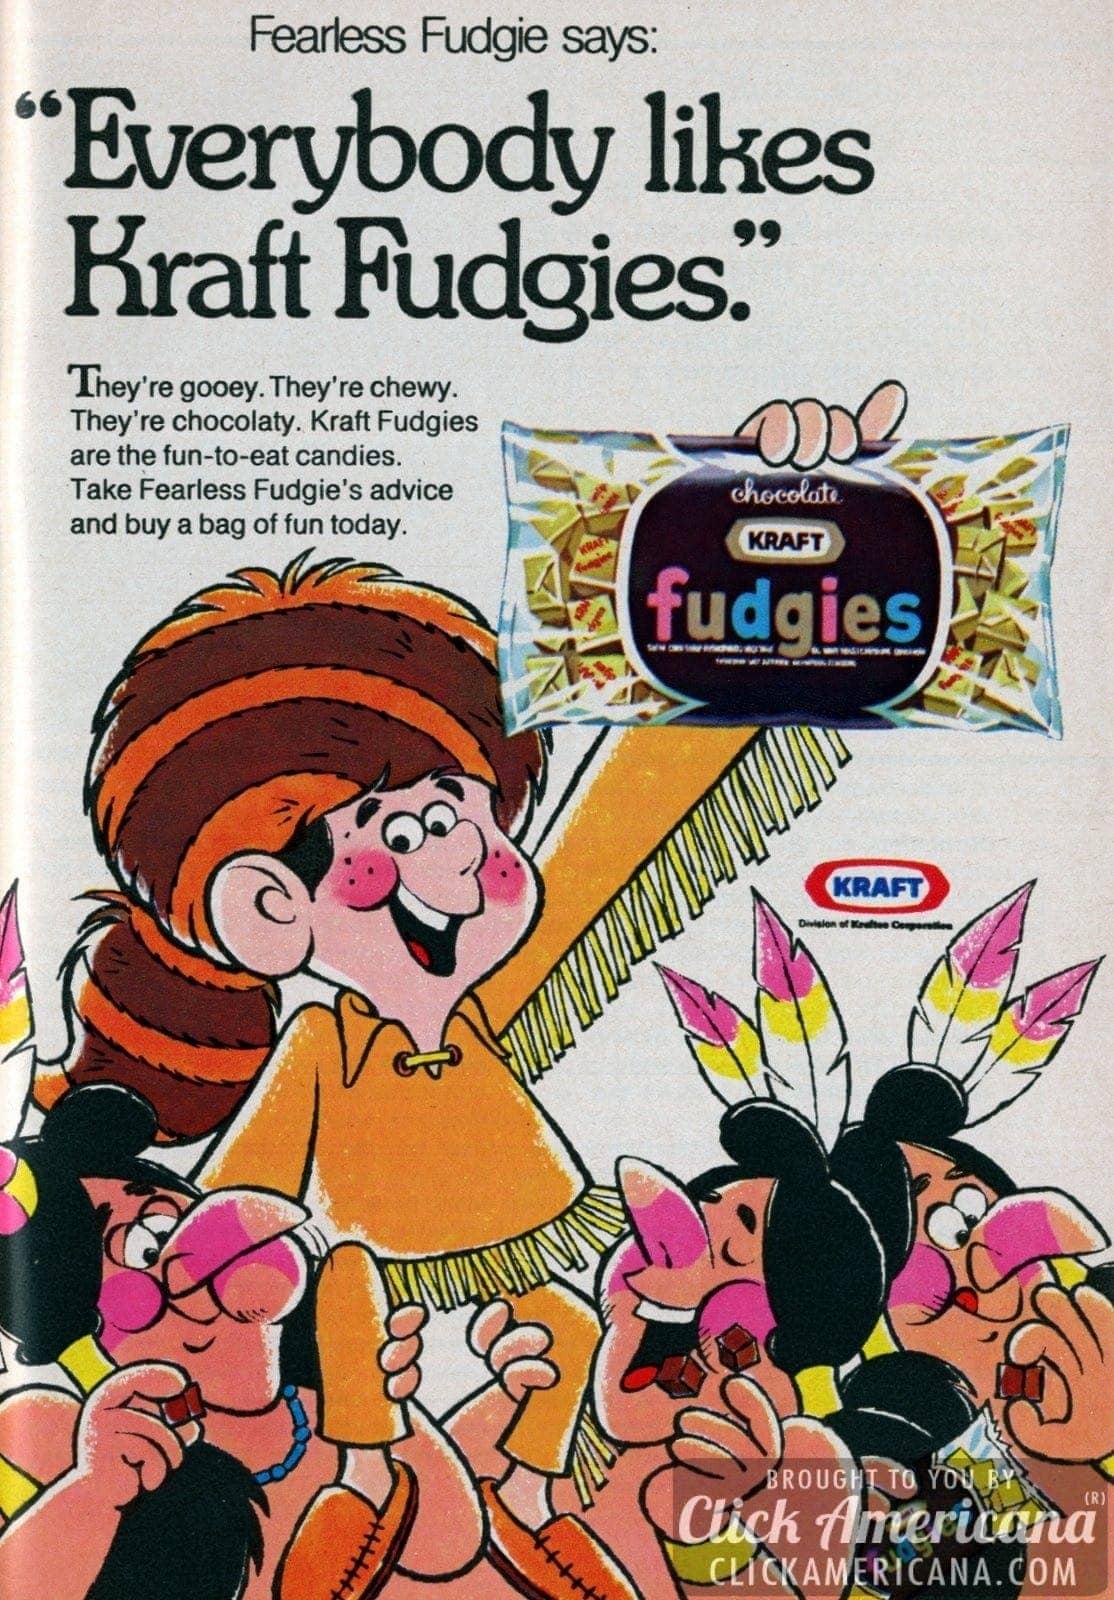 Fearless Fudgie says Everybody likes Kraft Fudgies (1971)